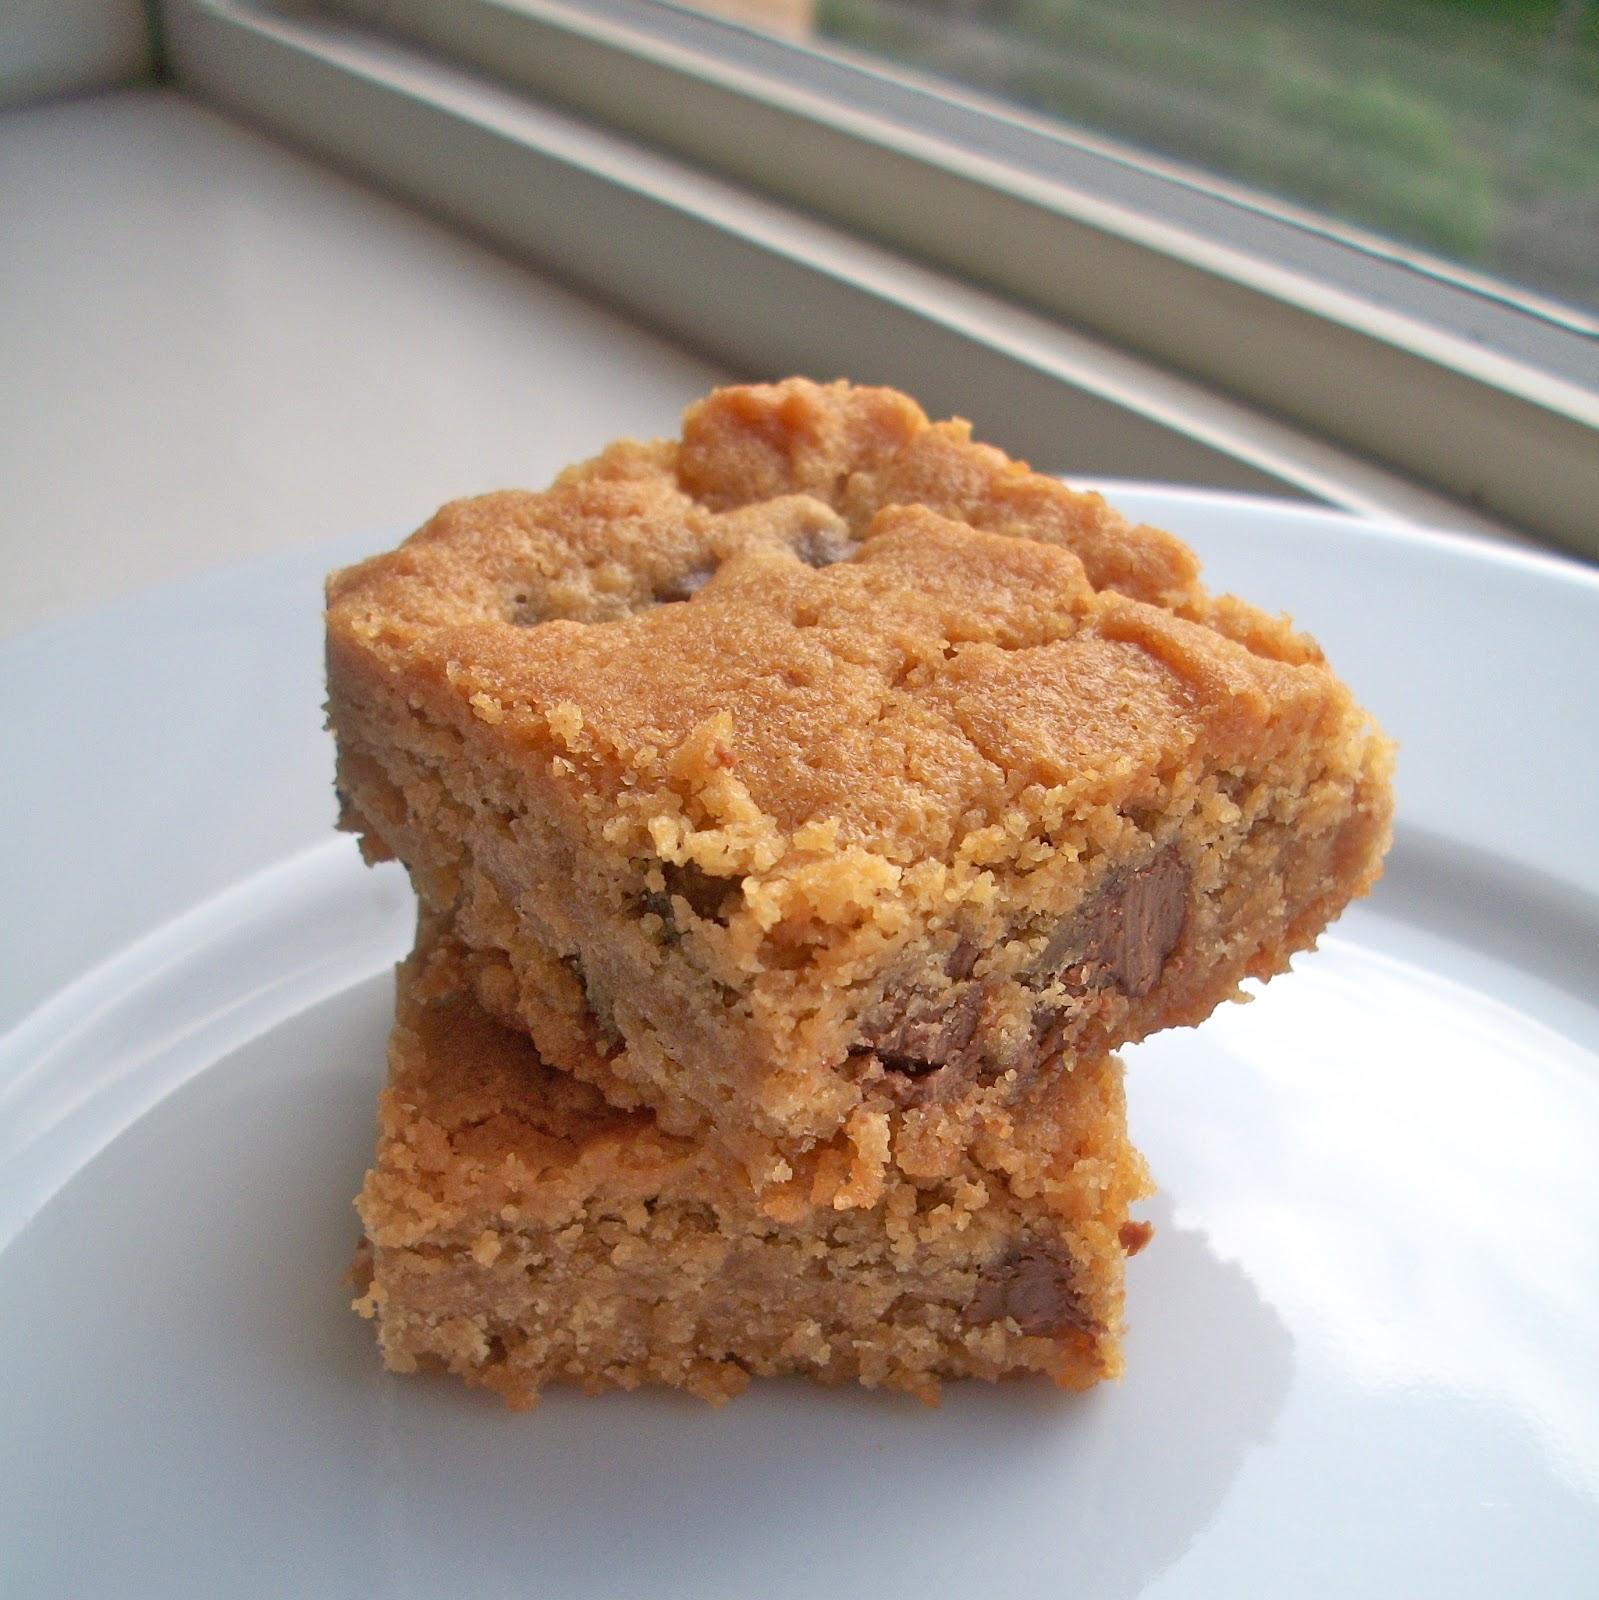 Brooke Bakes : Gluten-free Peanut Butter Chocolate Chip ...